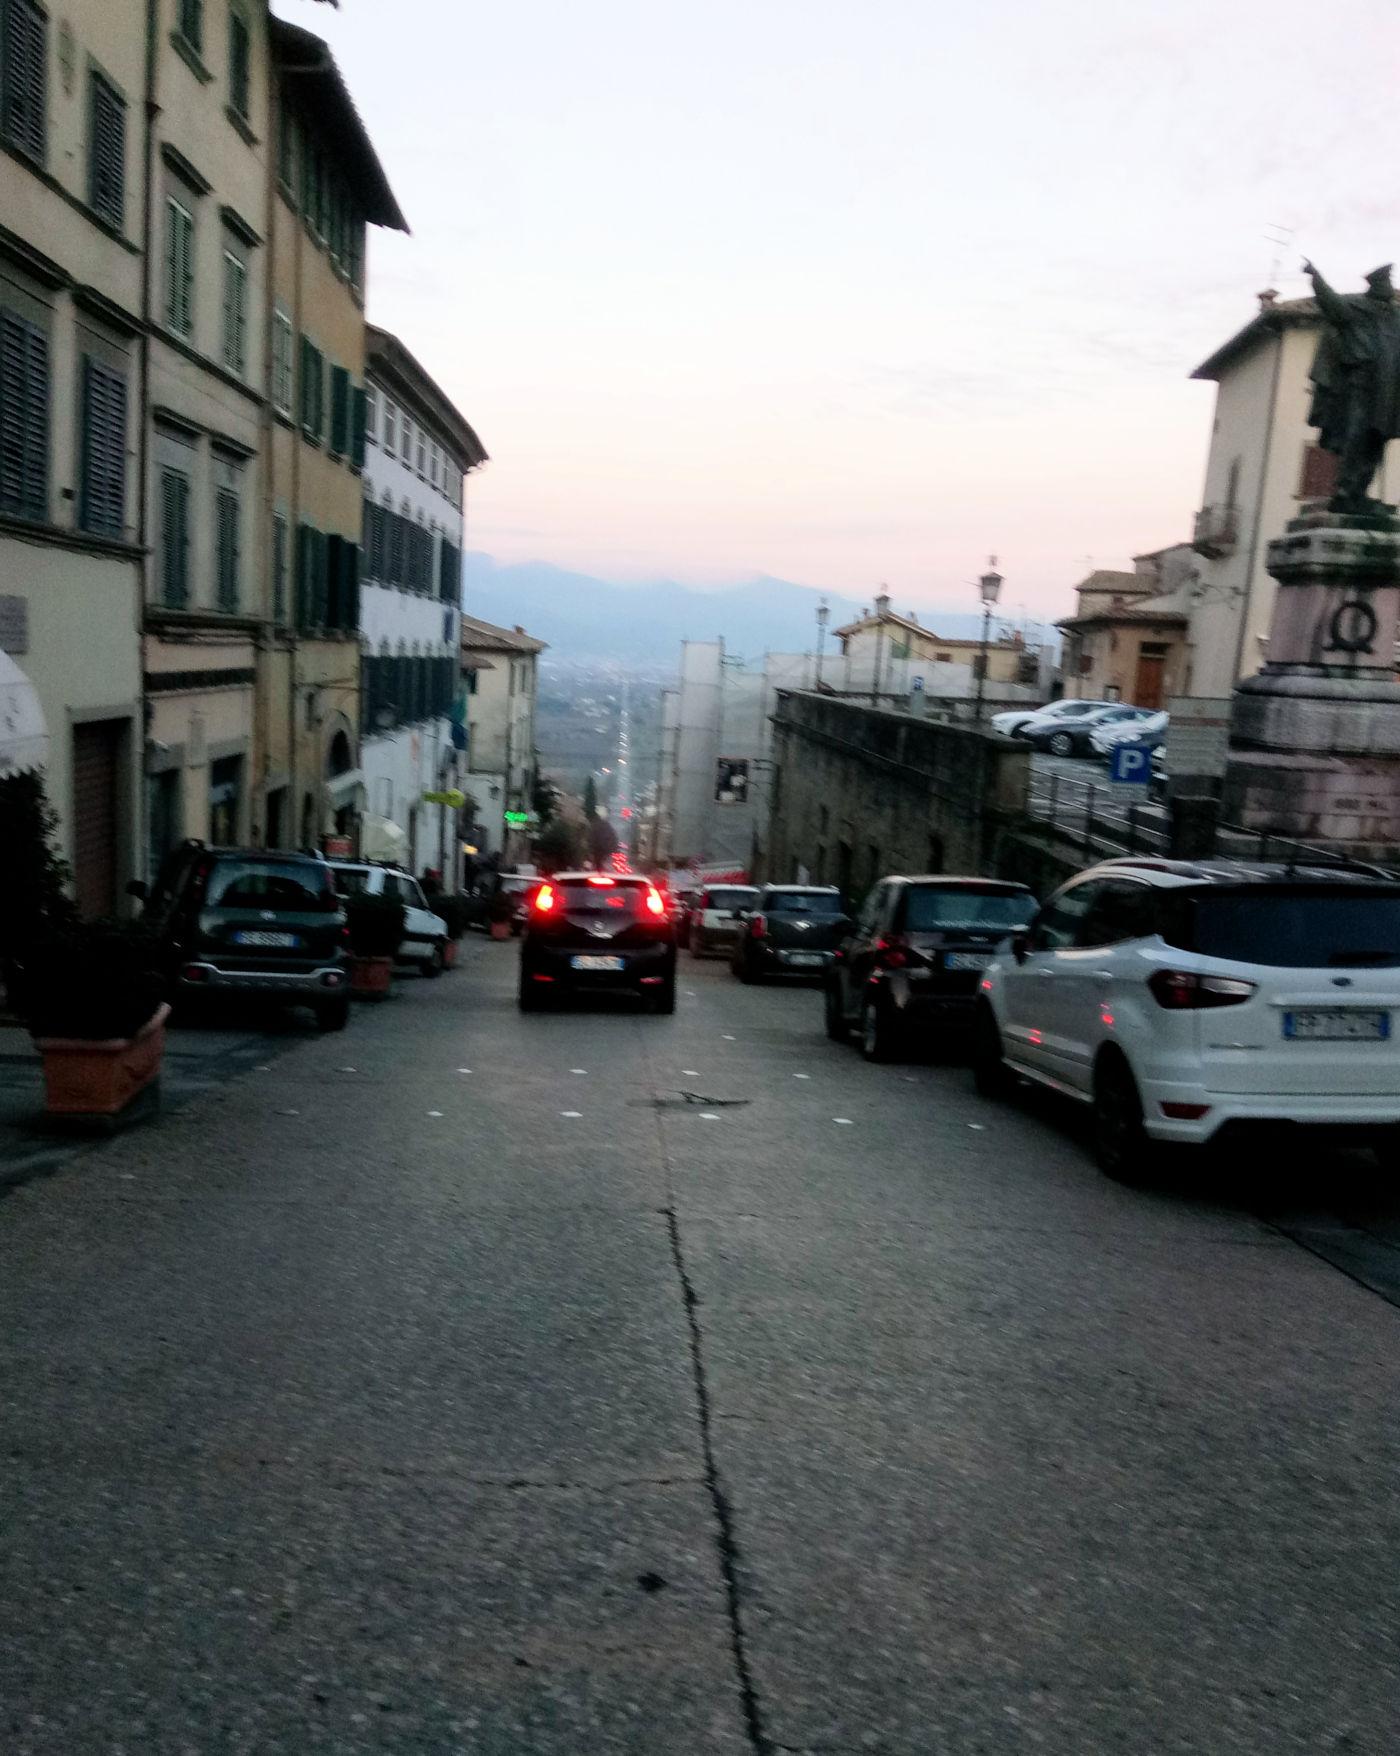 Toscana tra terme e borghi in caravan o camper - Ruga di San Martino